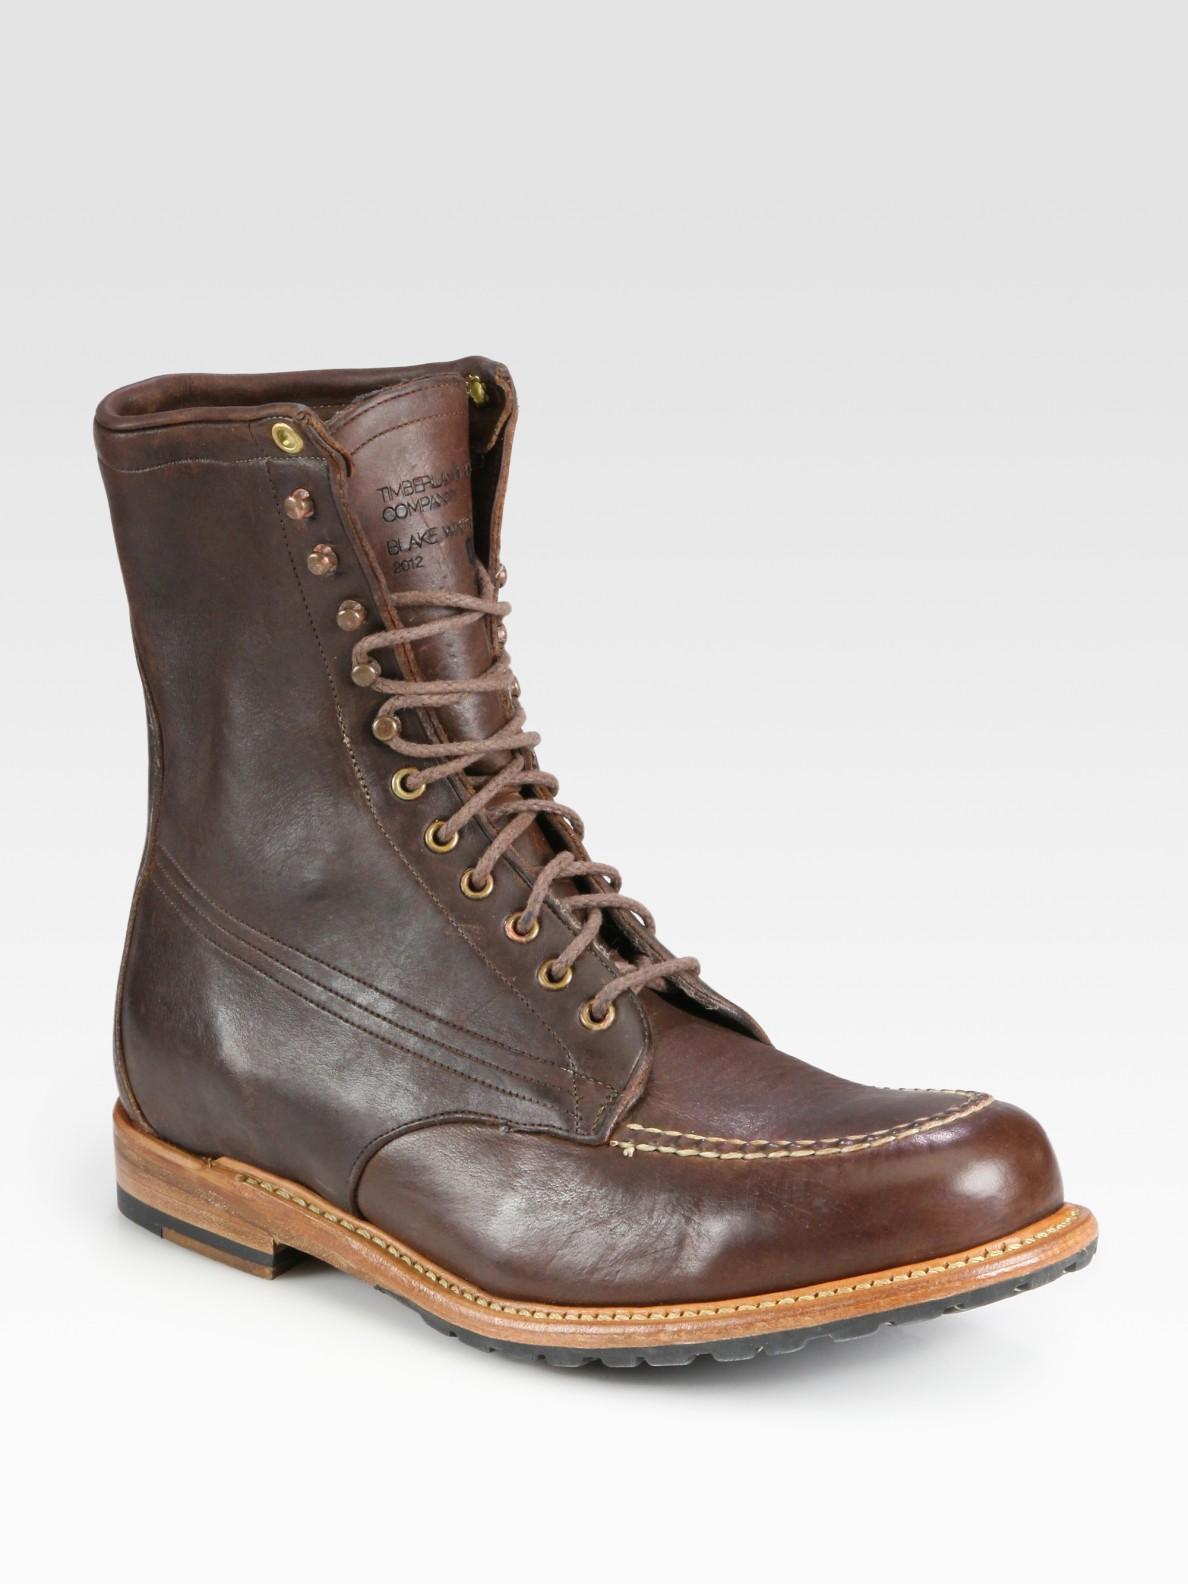 timberland blake winter moc boot in brown for men lyst. Black Bedroom Furniture Sets. Home Design Ideas